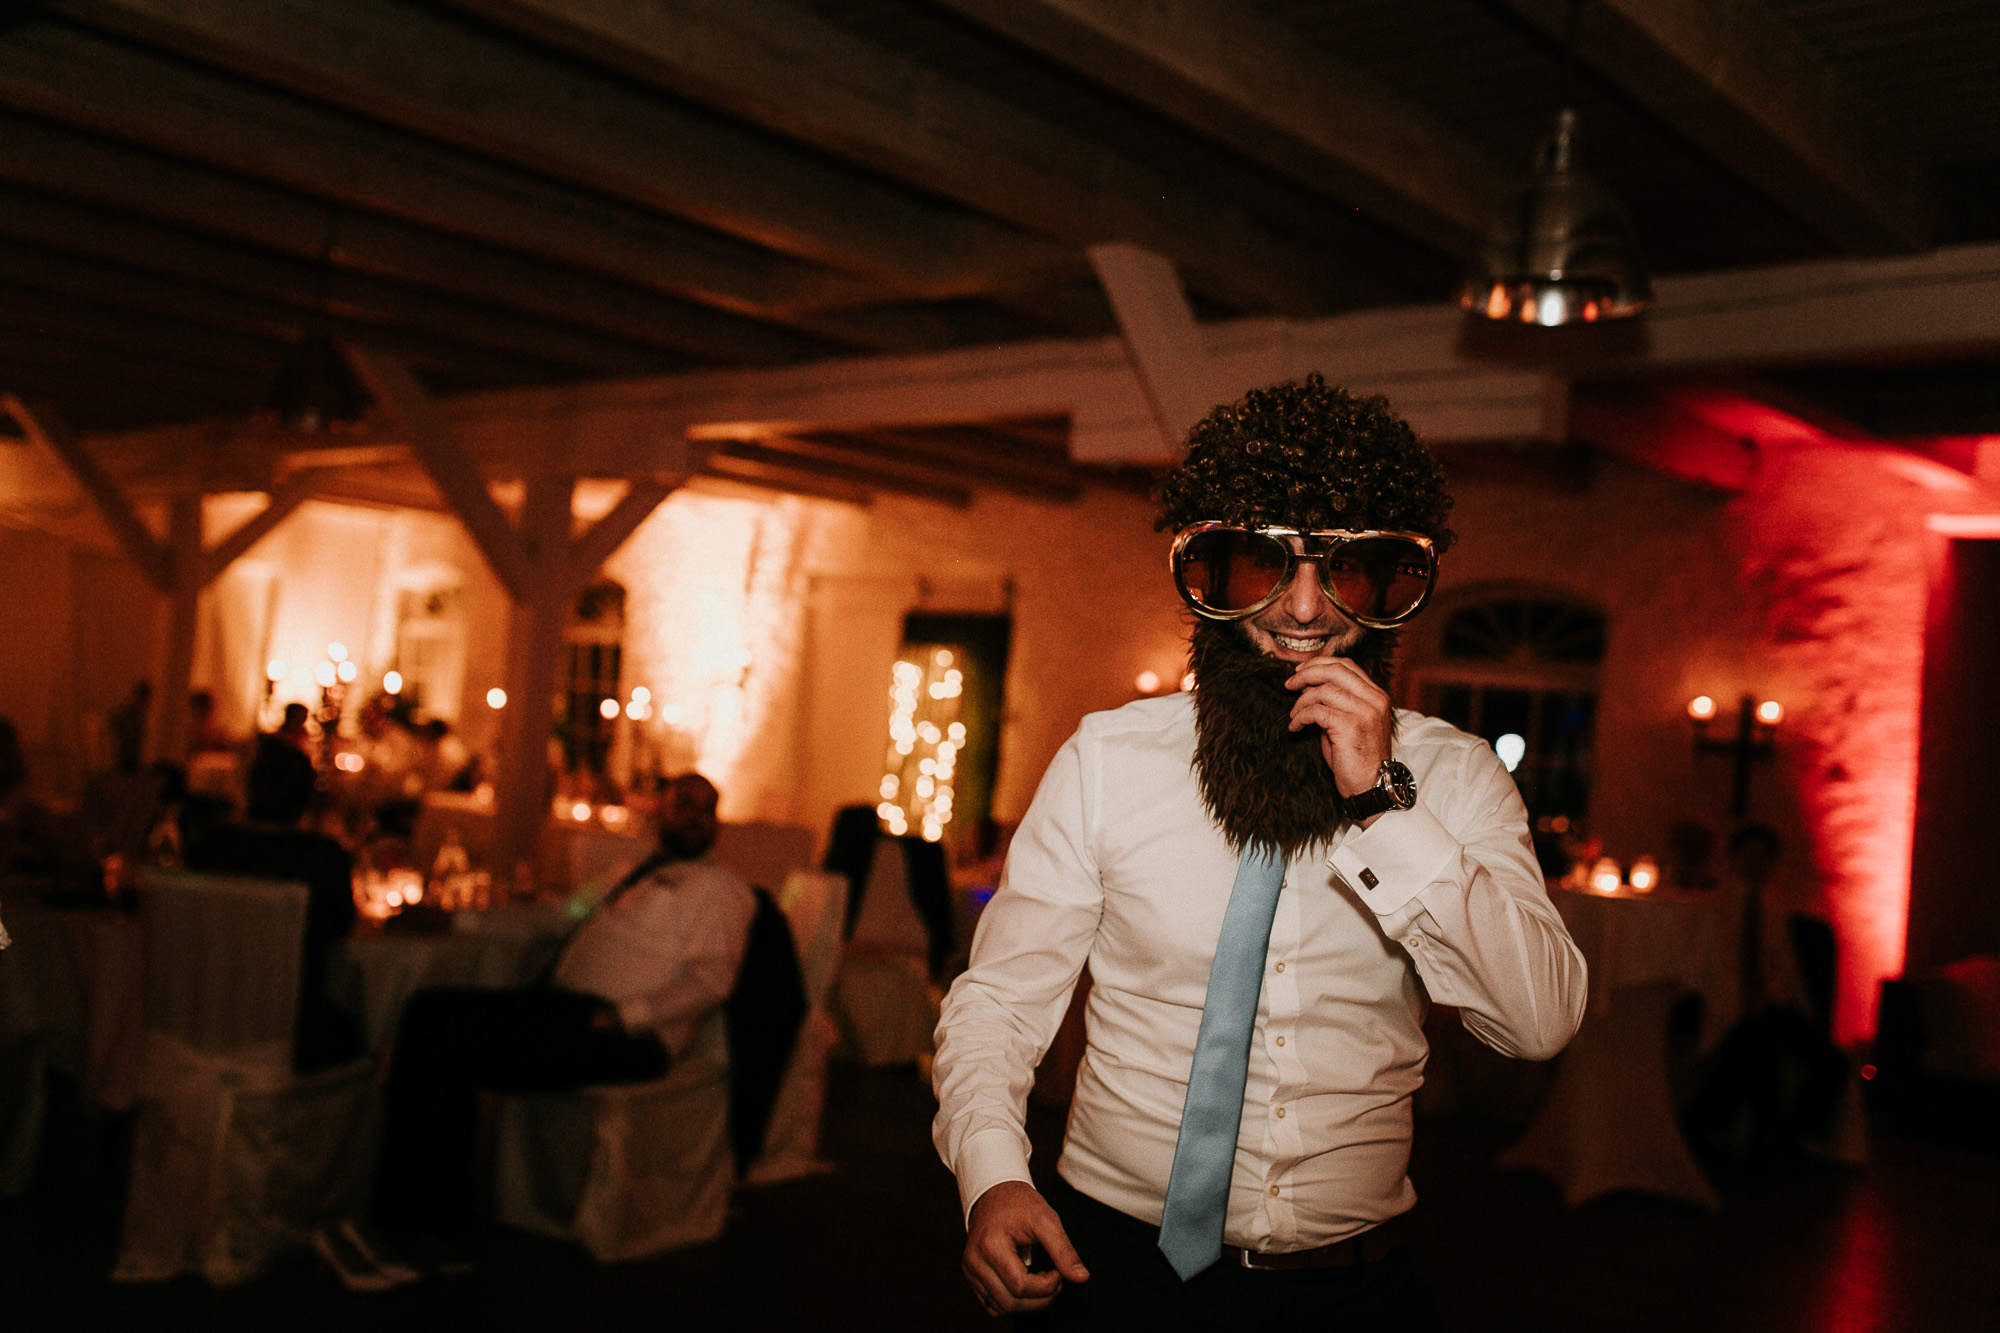 DanielaMarquardtPhotography_Hochzeitsfotograf_Düsseldorf_Köln_Mallorca_Bayern_Austria_Harz_Wedding_AileenundLennart_Weddingphotographer_Ibiza_Tuskany_Italien_Toskana_Portugal_Lissabon286